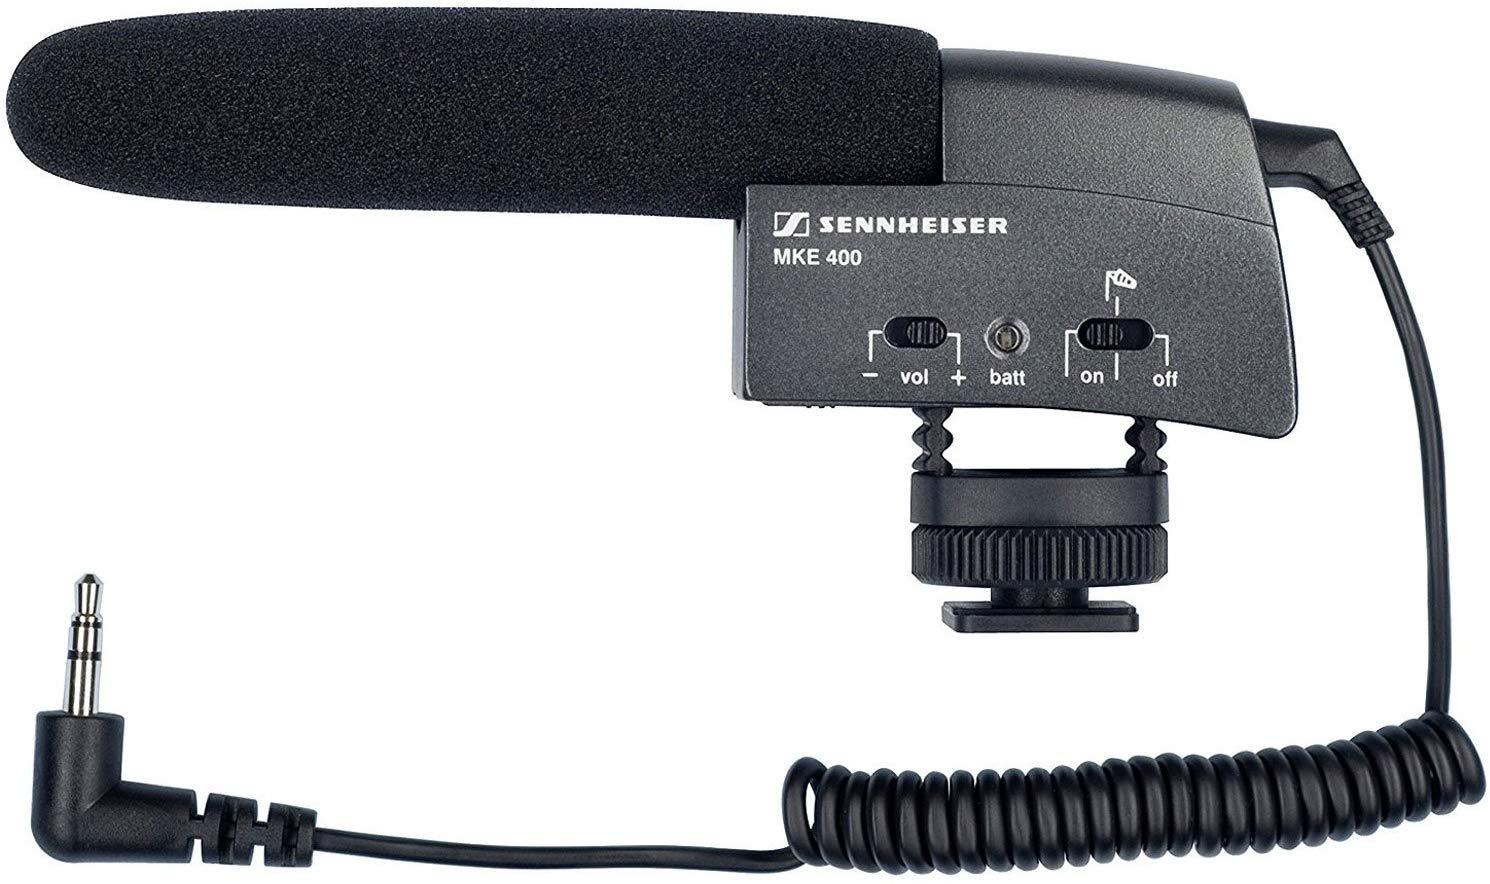 Sennheiser MKE 400 Shotgun Microphone for DSLR or Camcorder £84 @ Amazon